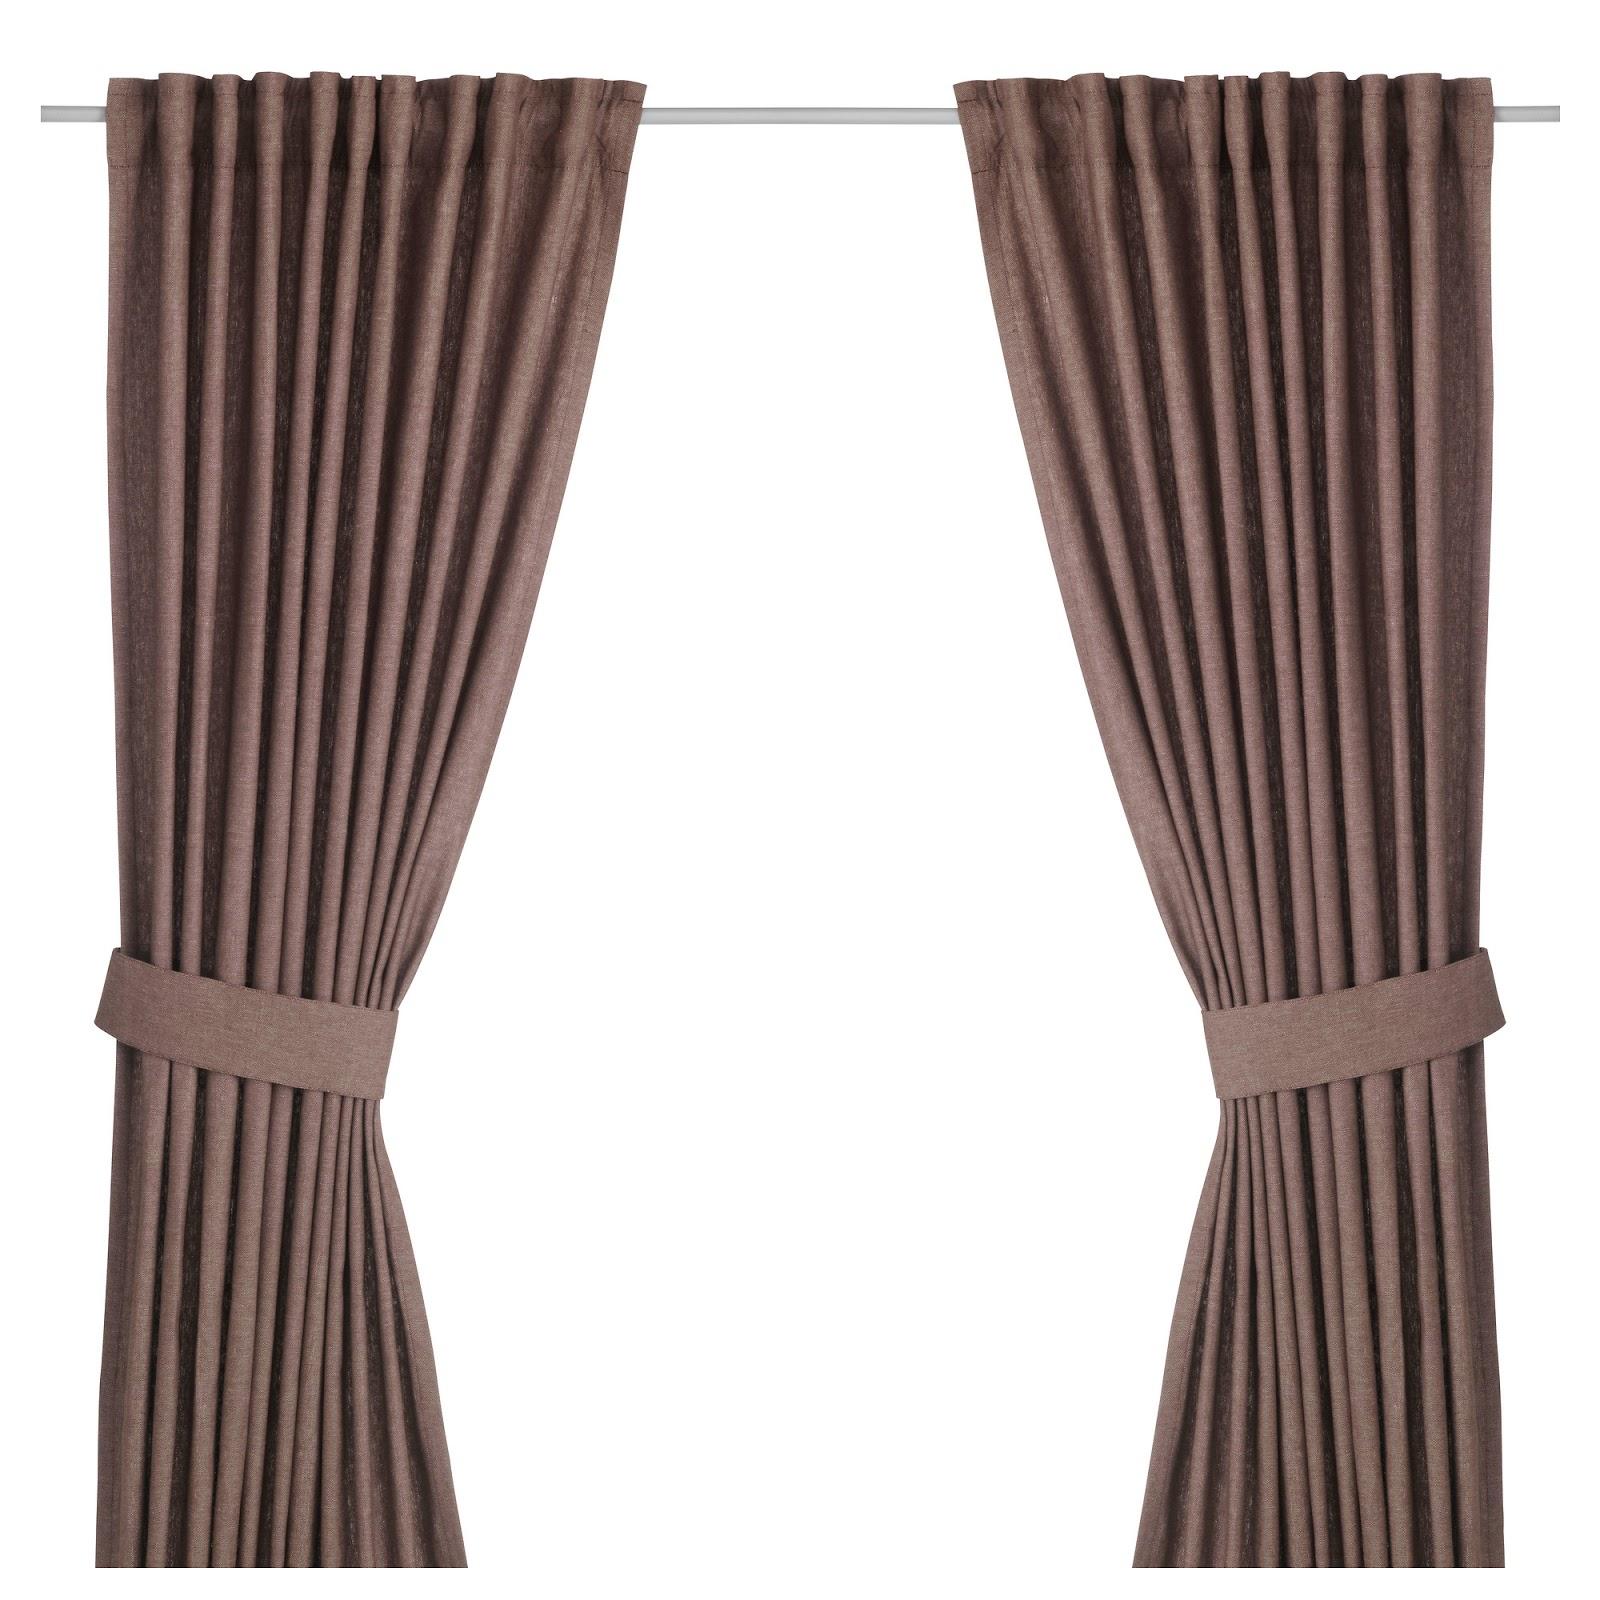 Customizable Shower Curtains Cute Bedroom Curtain Ideas Tie Backs